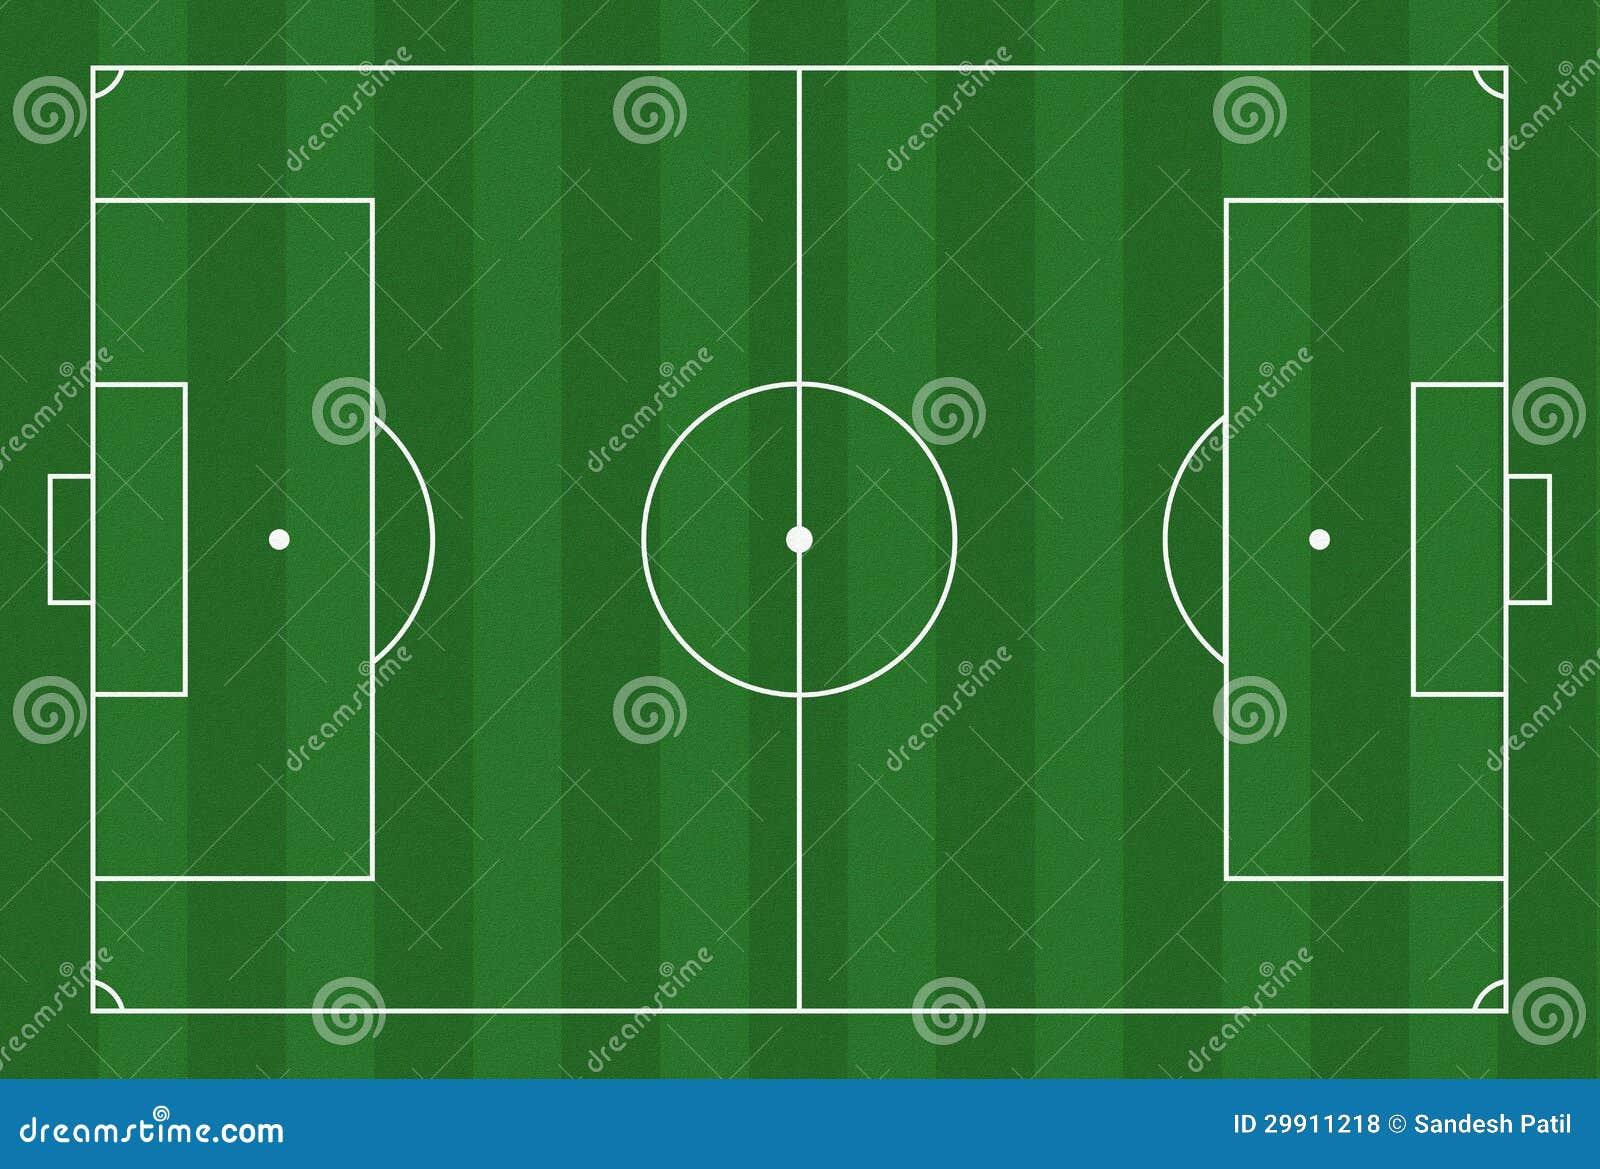 super football playground free download